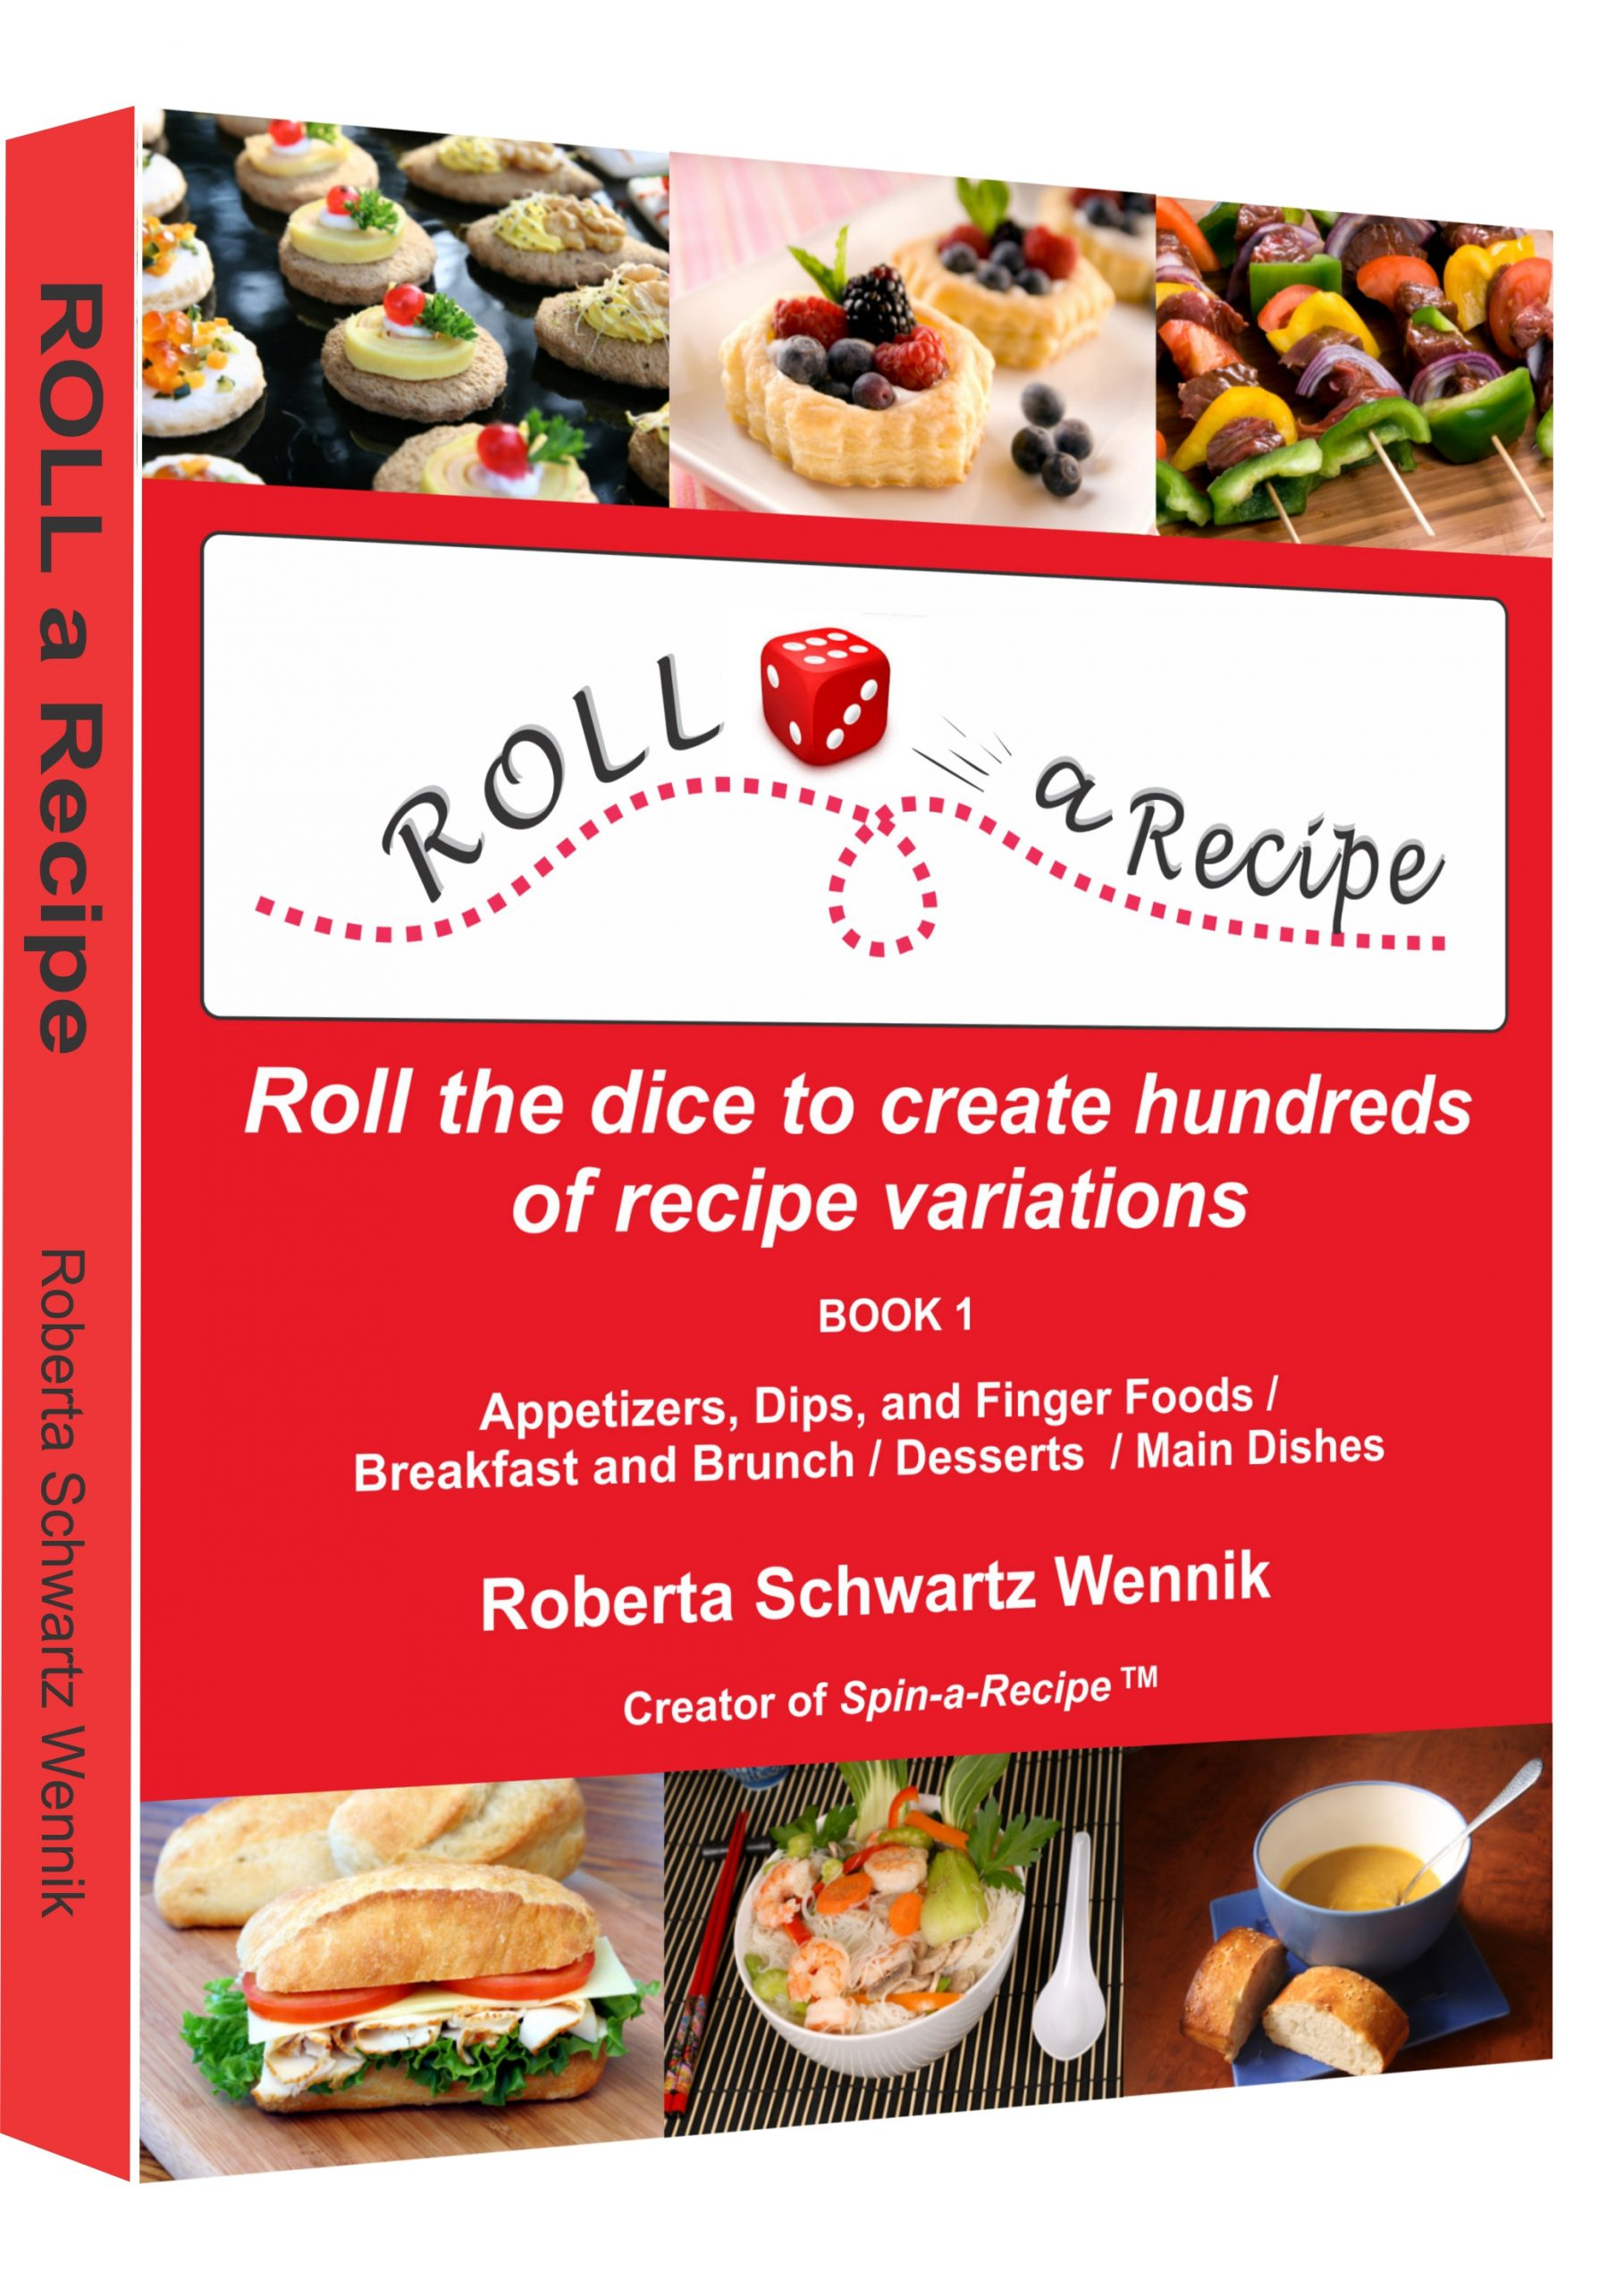 Roll a Recipe by Roberta Schwartz Wennik